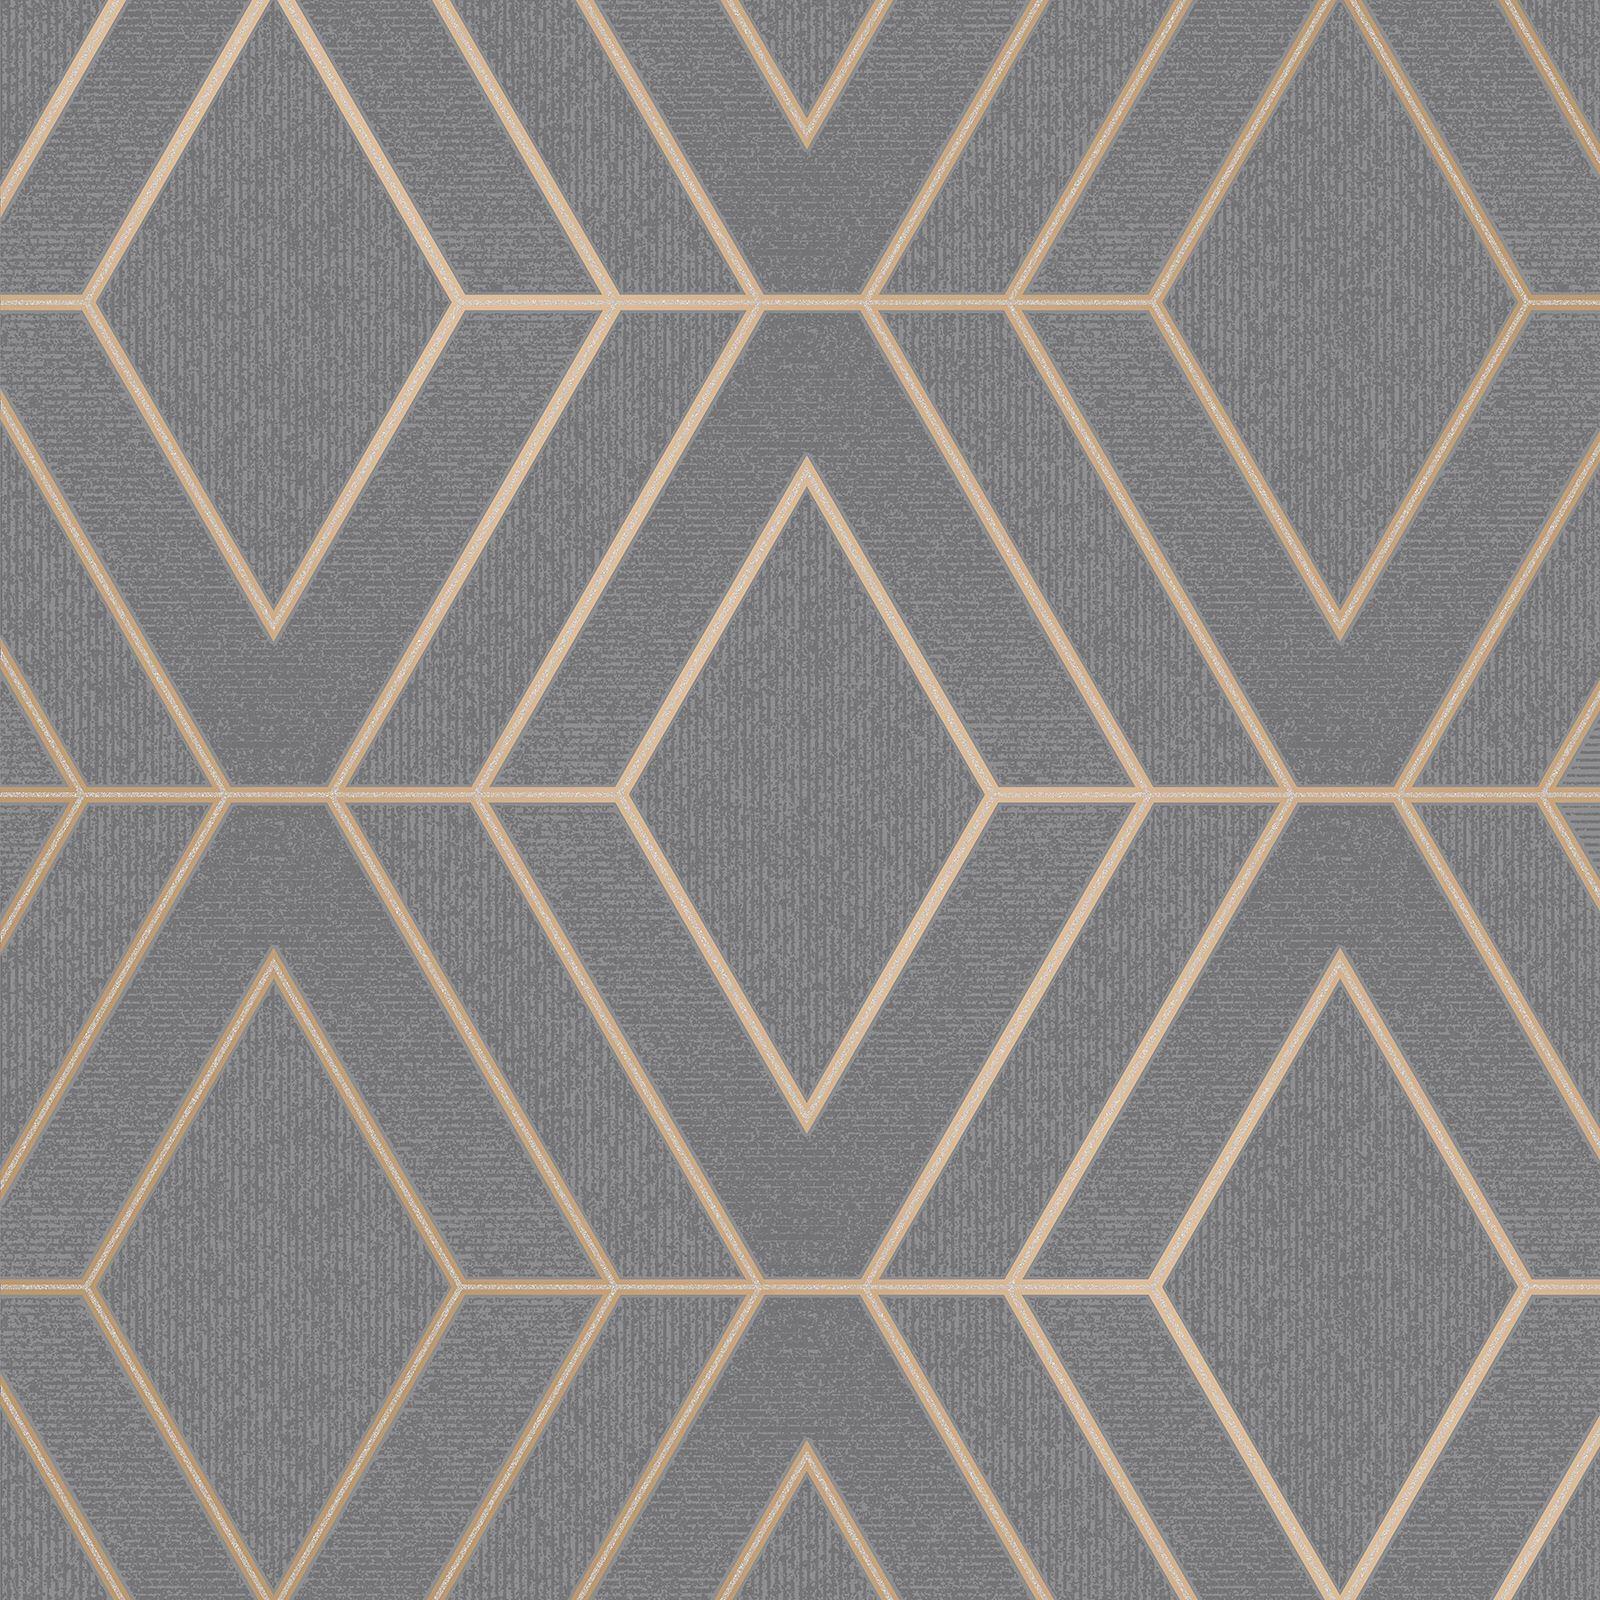 16 Rose Gold And Copper Details For Stylish Interior Decor: GEOMETRIC WALLPAPER MODERN DECOR TRIANGLES TRELLIS SILVER